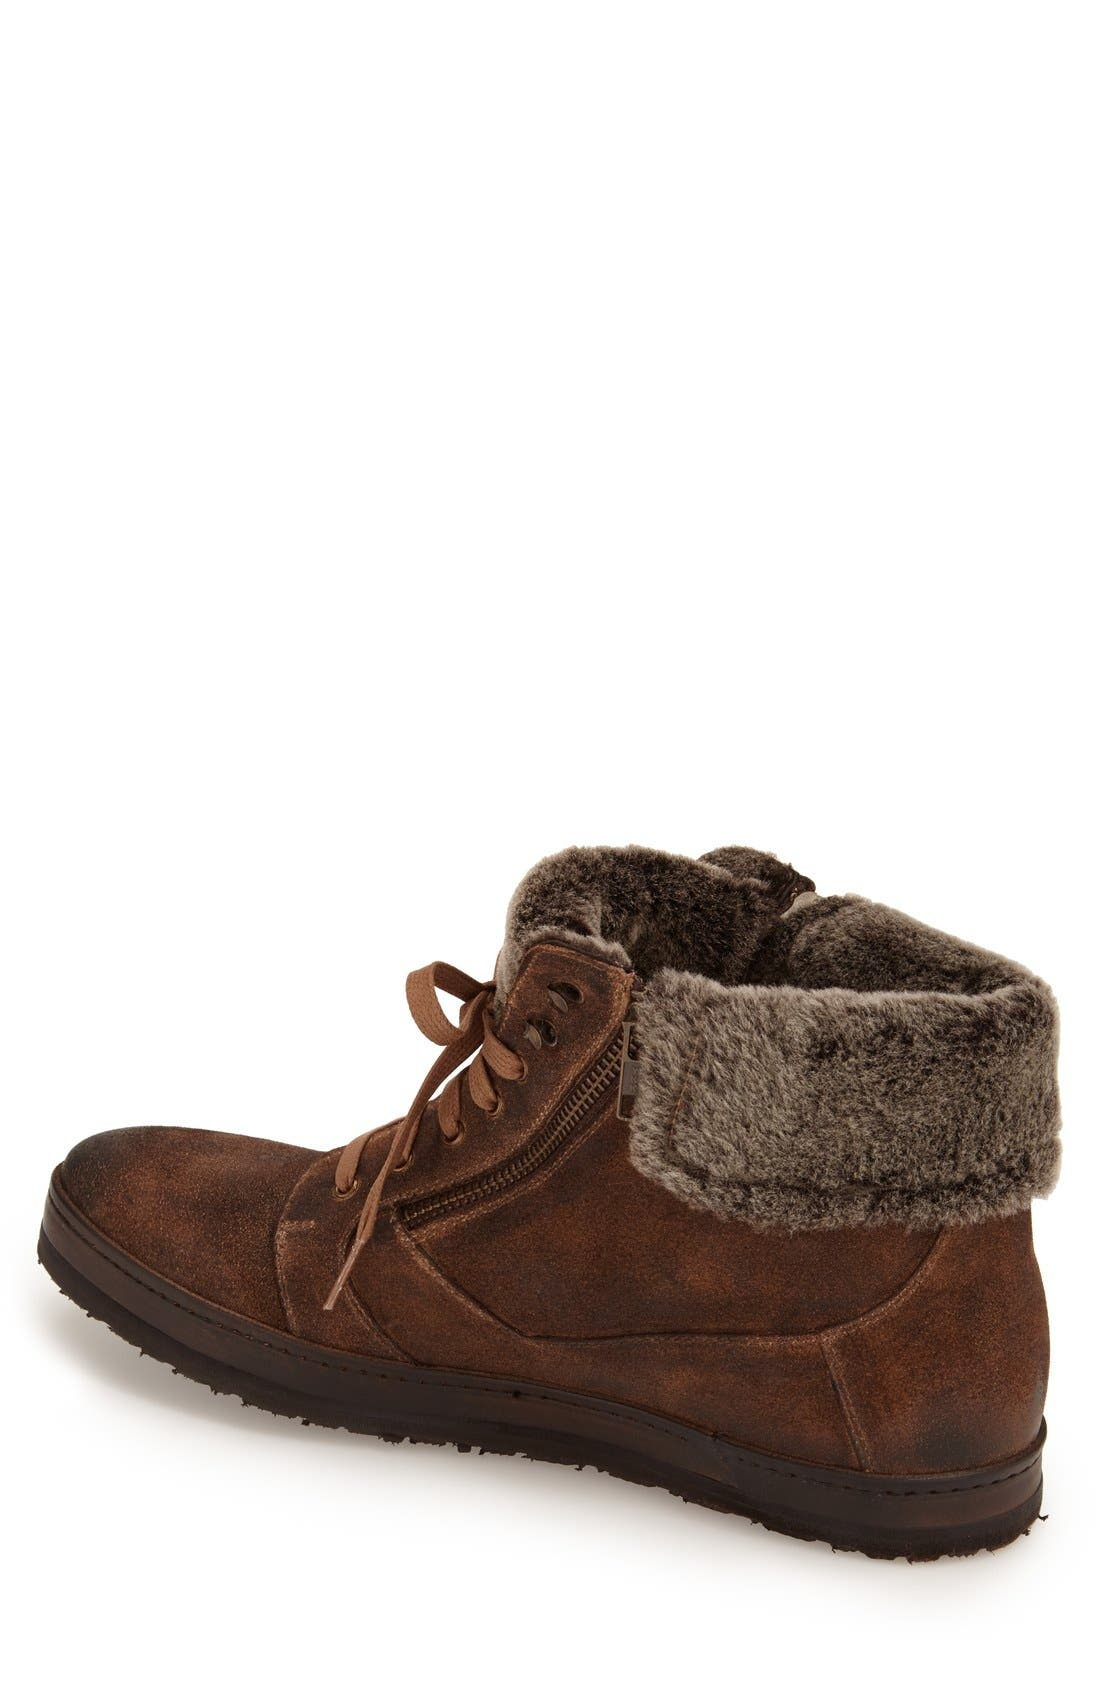 'Utrech' Sneaker Boot,                             Alternate thumbnail 2, color,                             Taupe